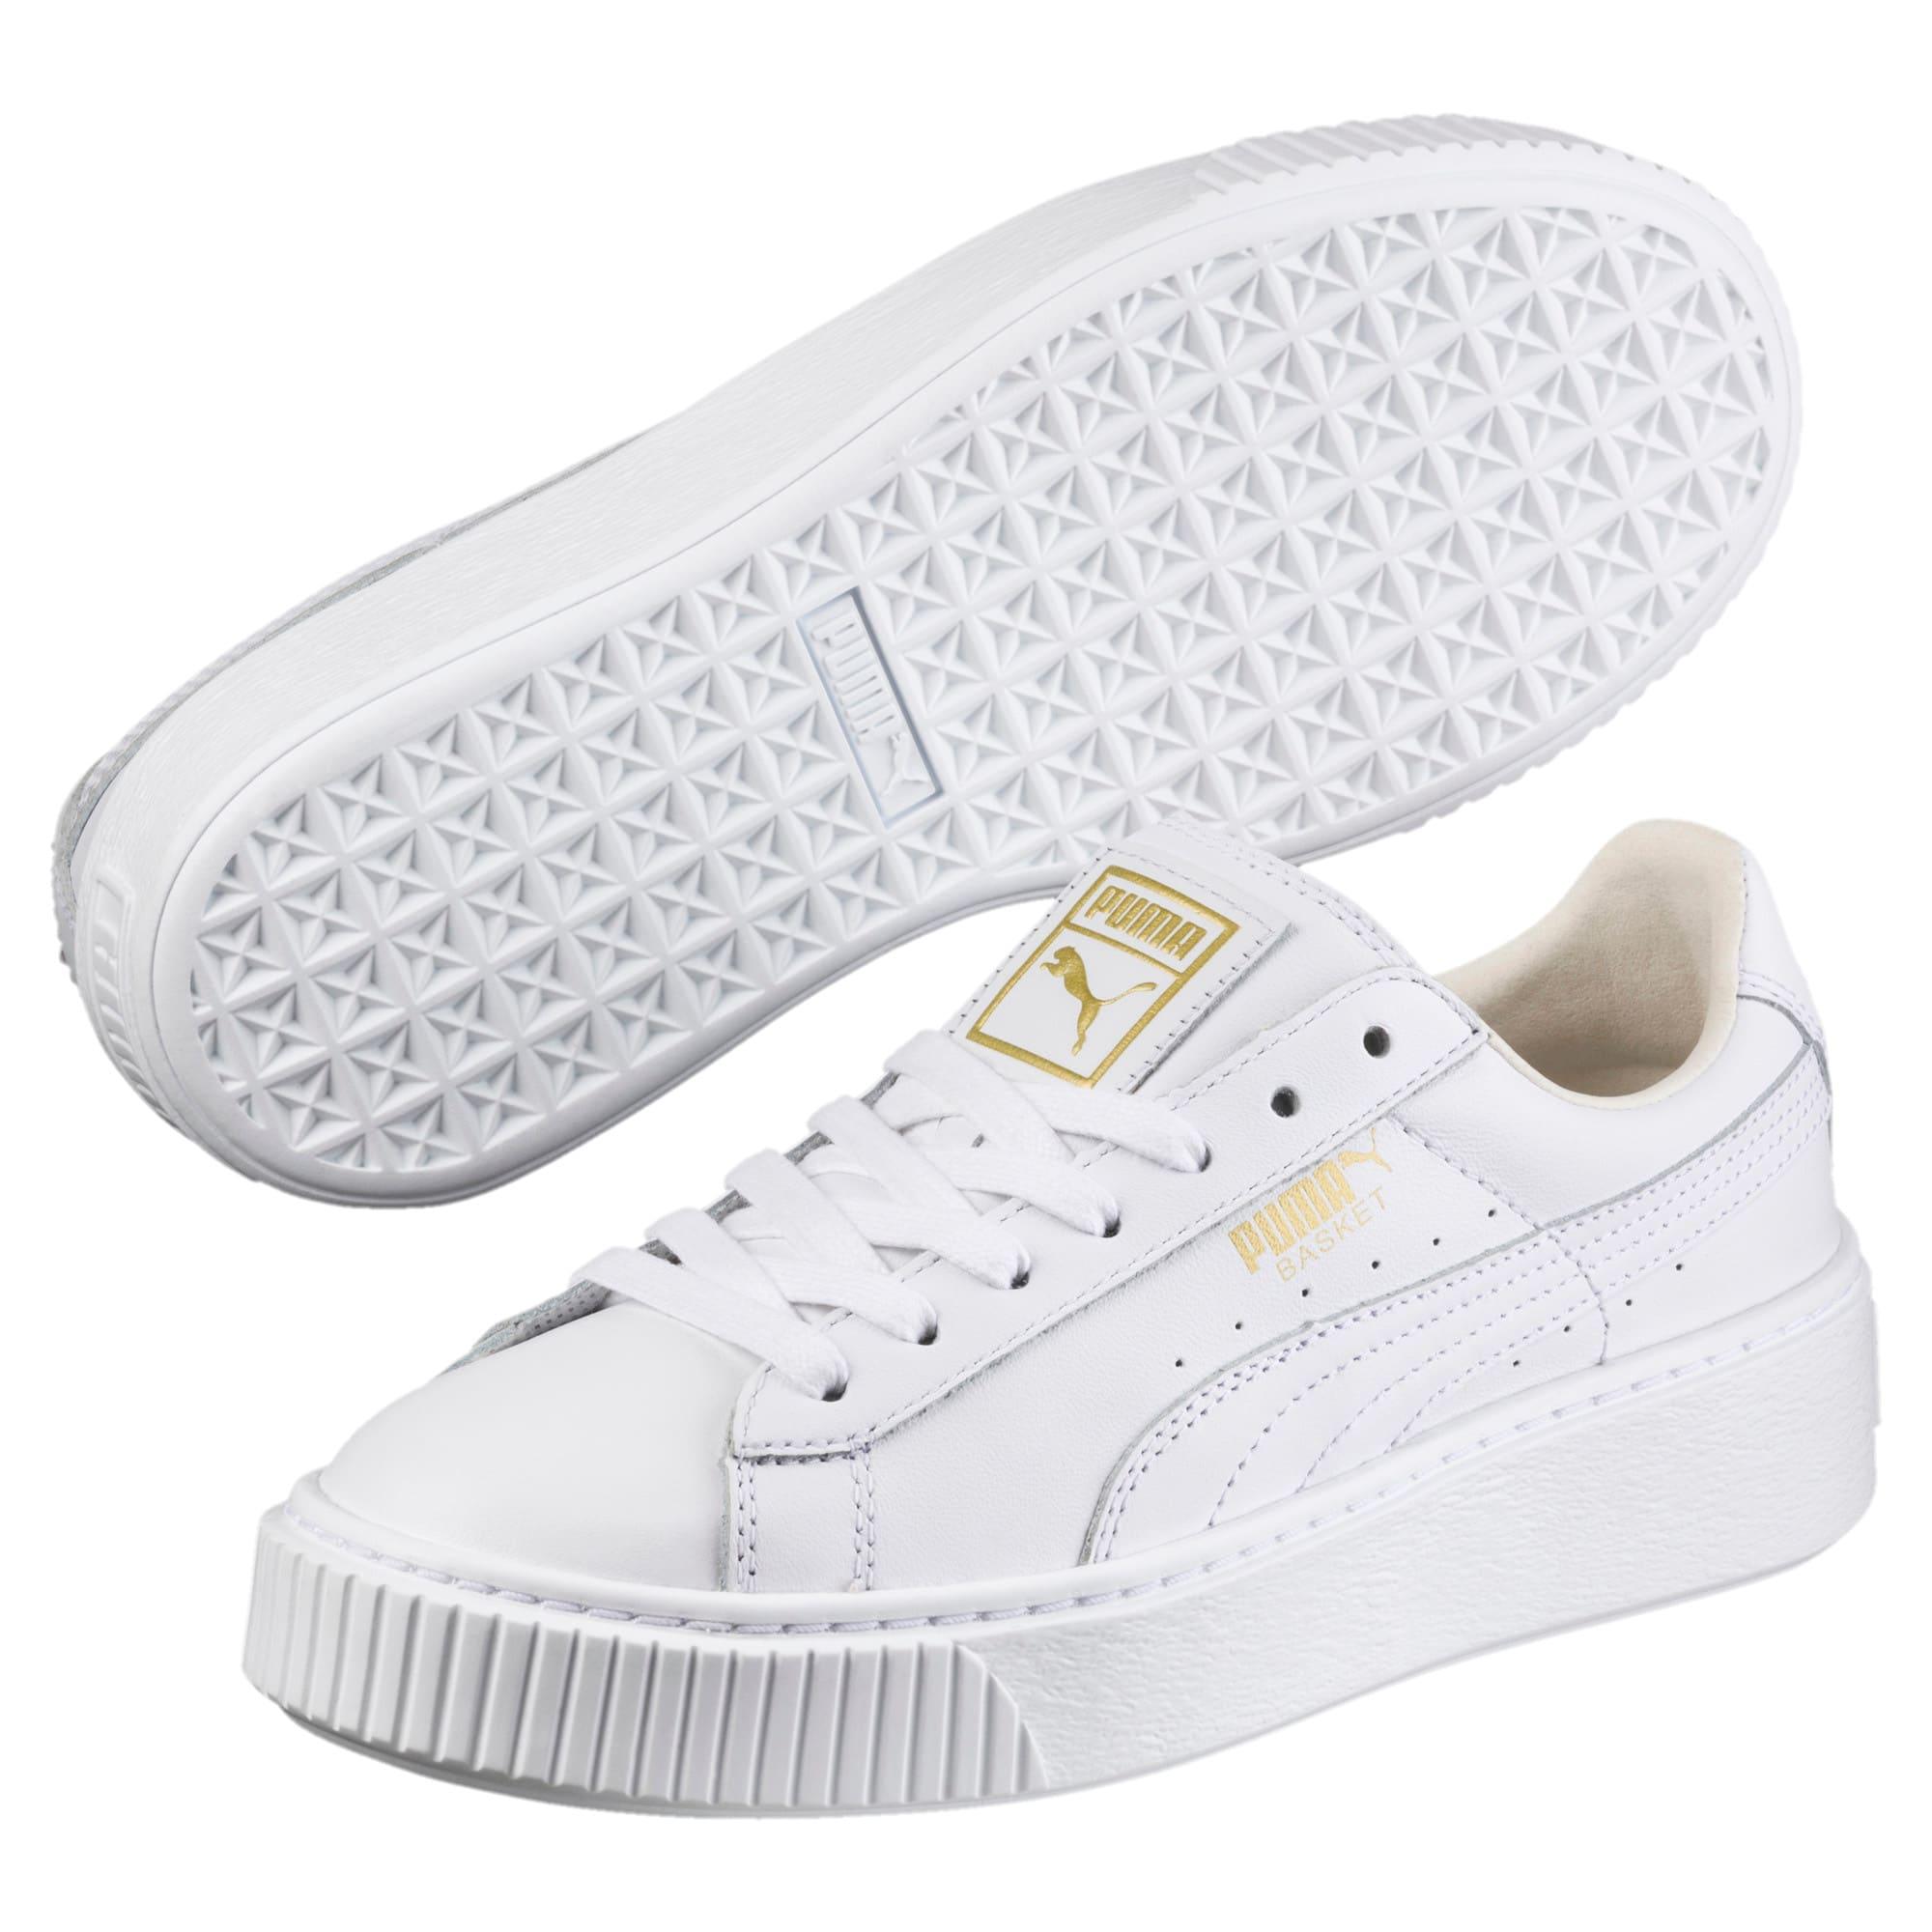 Thumbnail 2 of Basket Platform Core Women's Sneakers, Puma White-Gold, medium